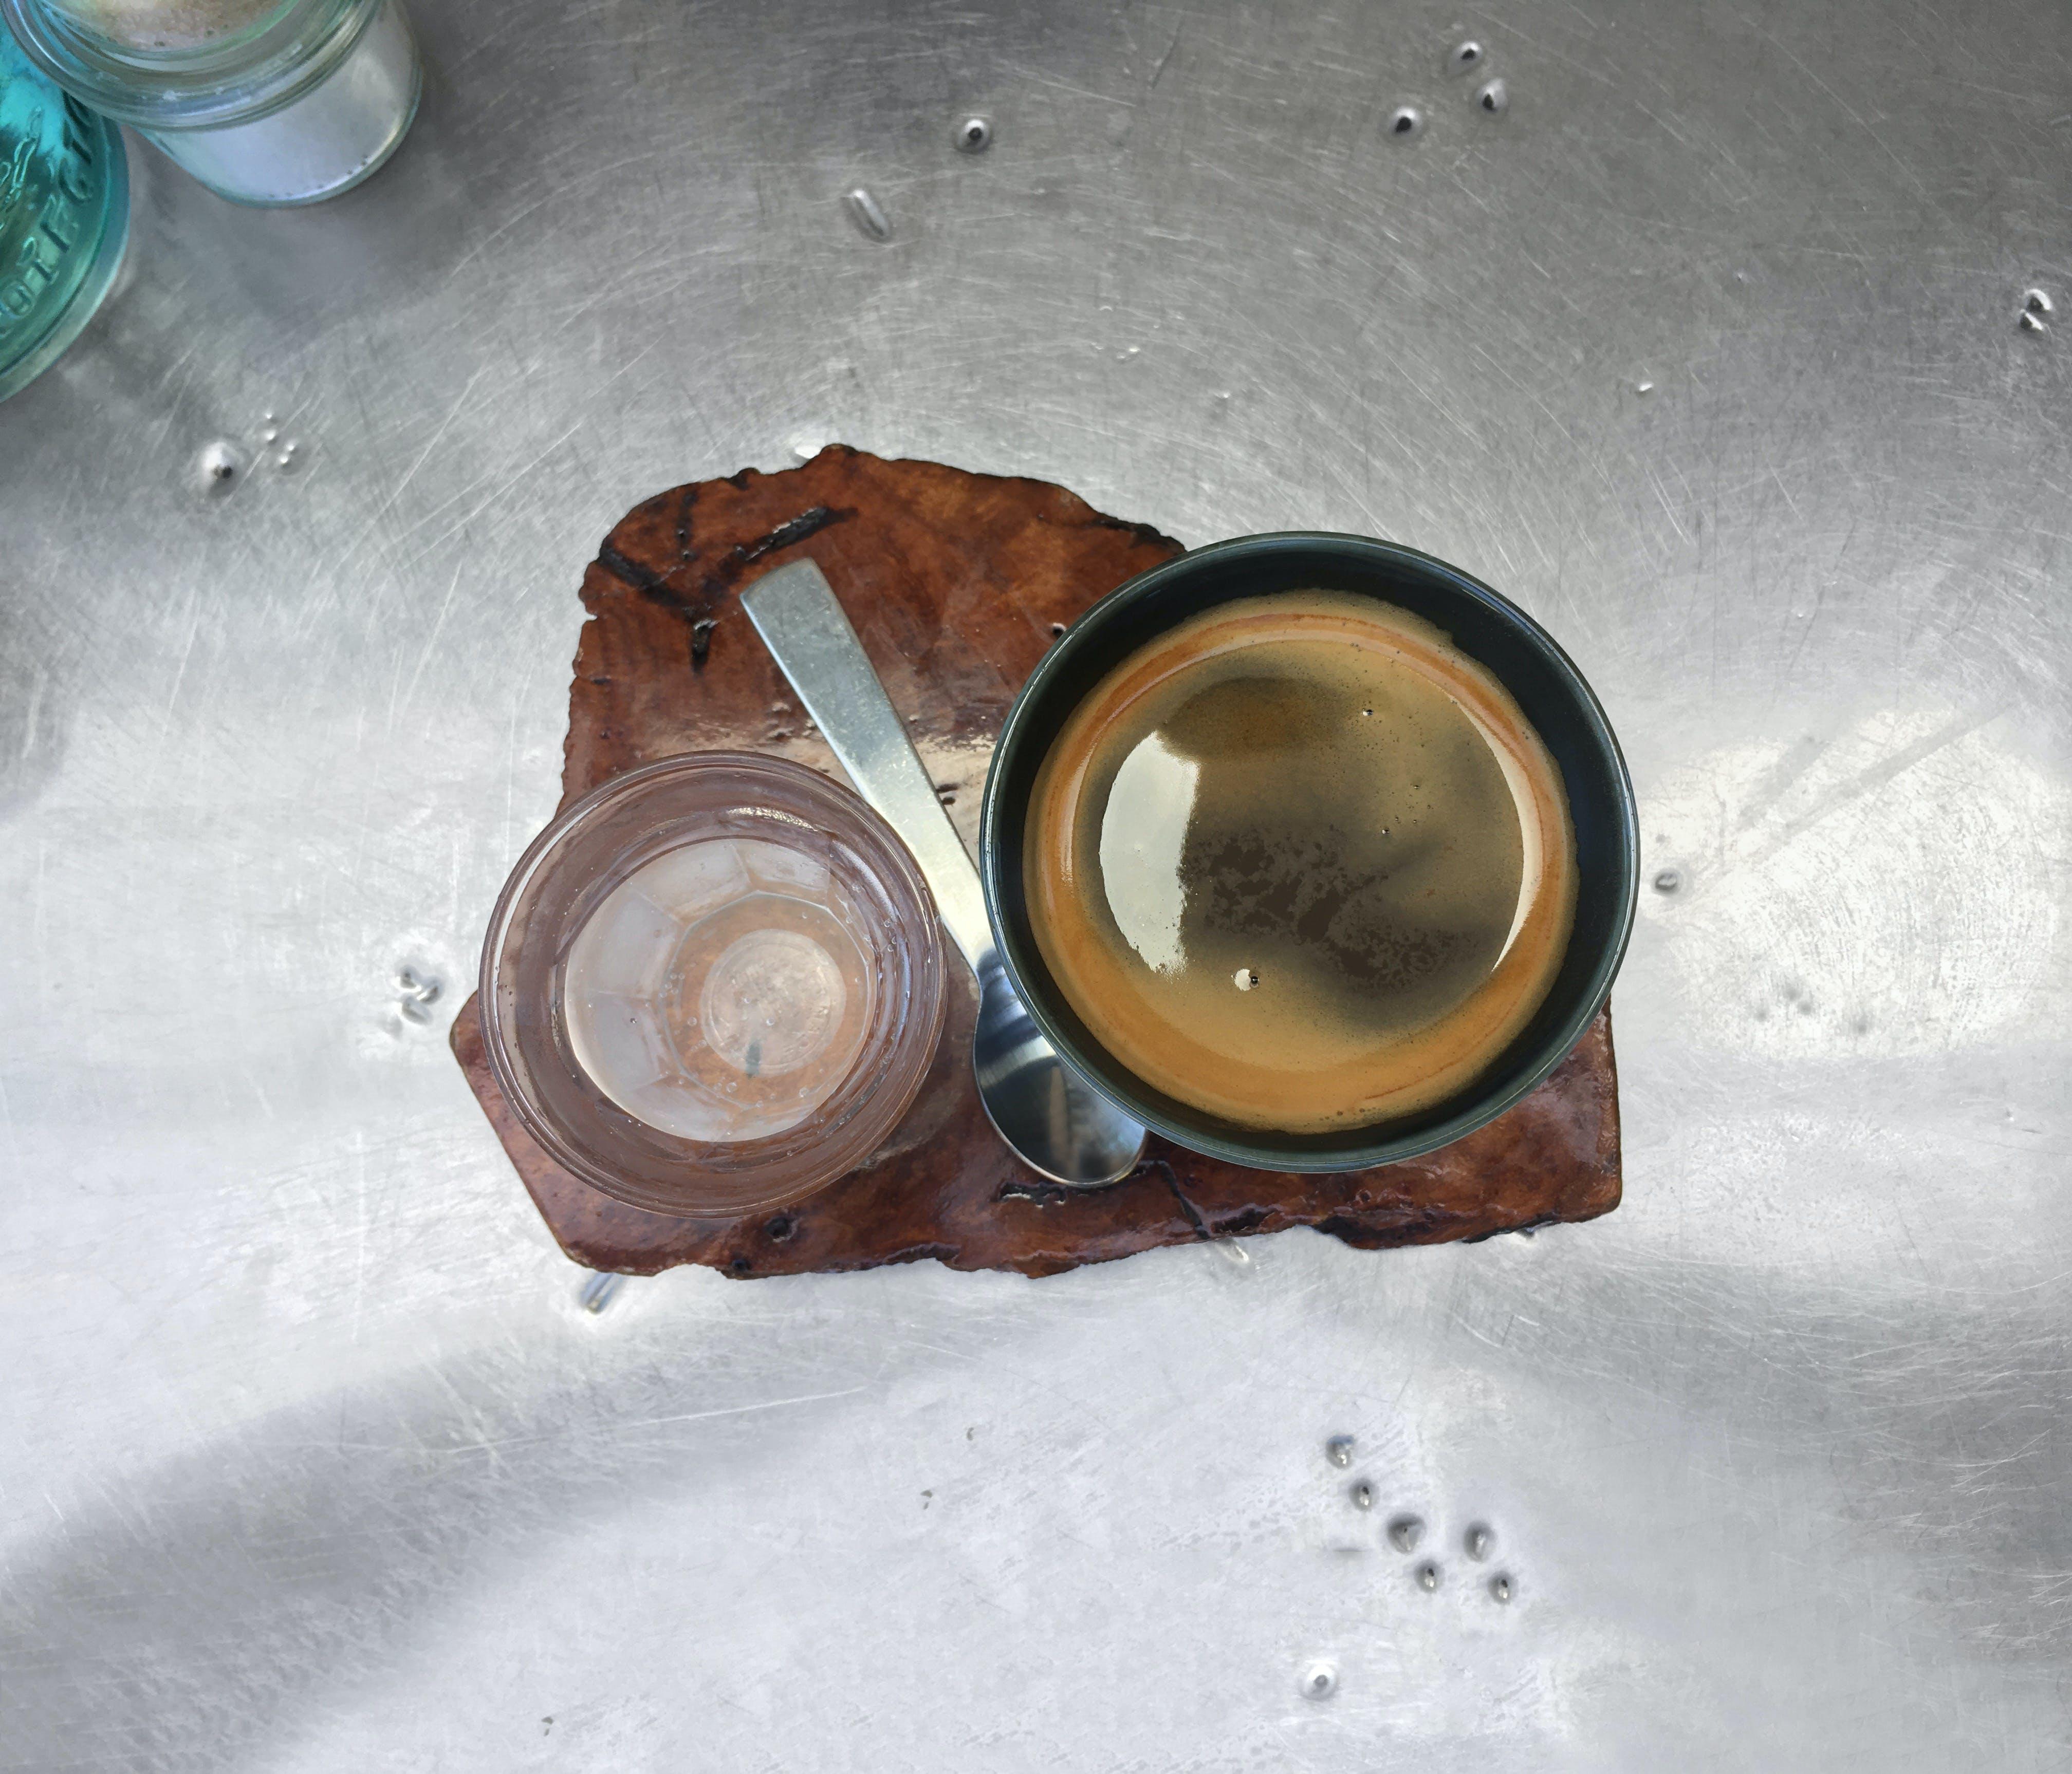 Gratis stockfoto met cafeïne, cappuccino, donkere koffie, drank